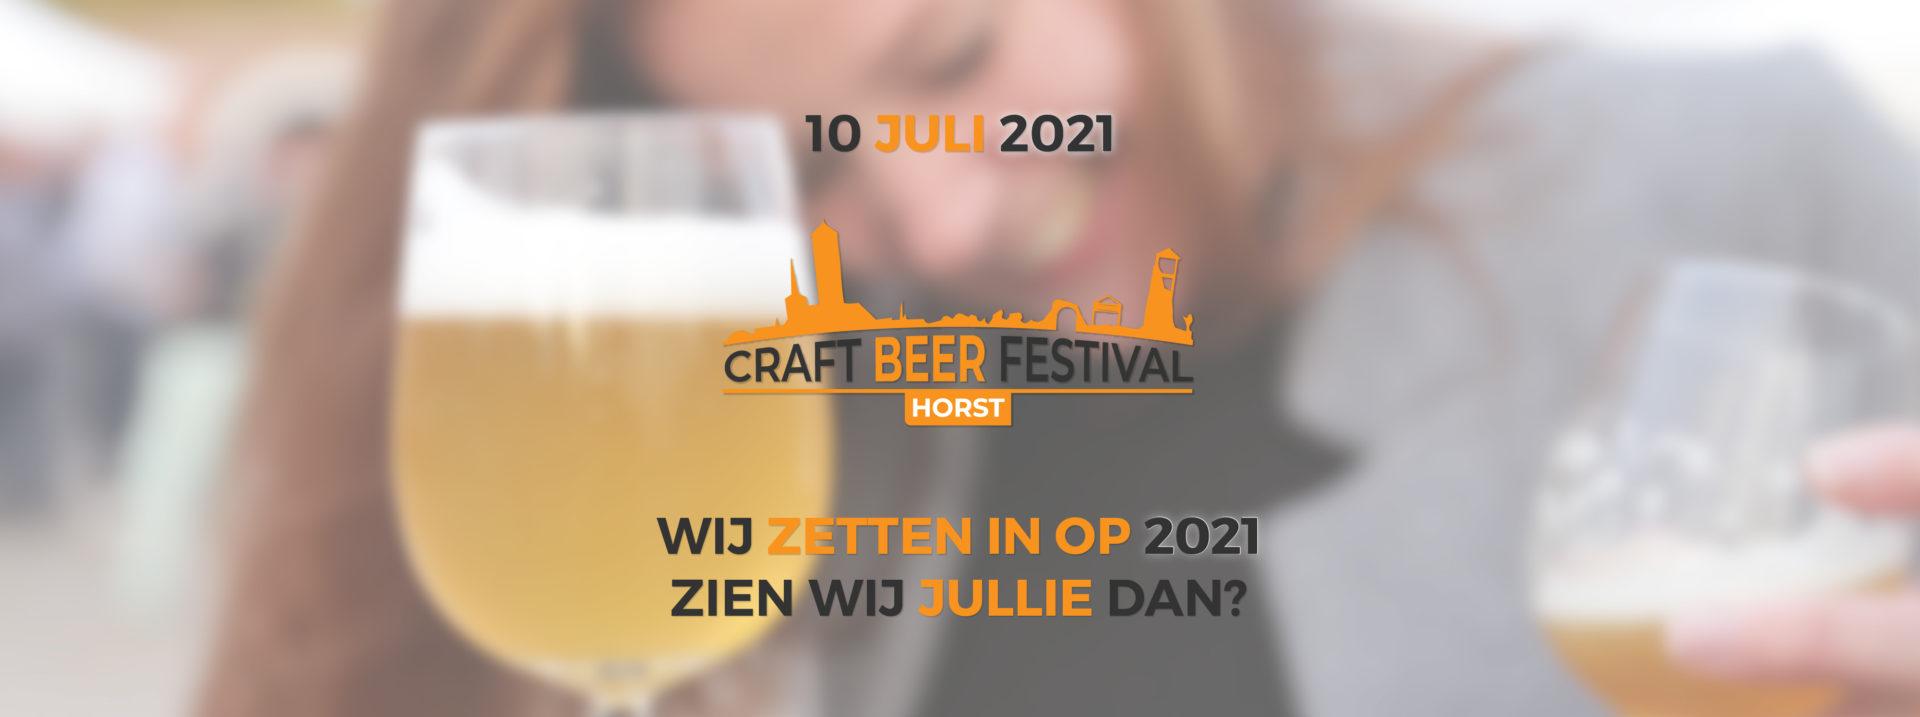 Craft Beer Festival Horst